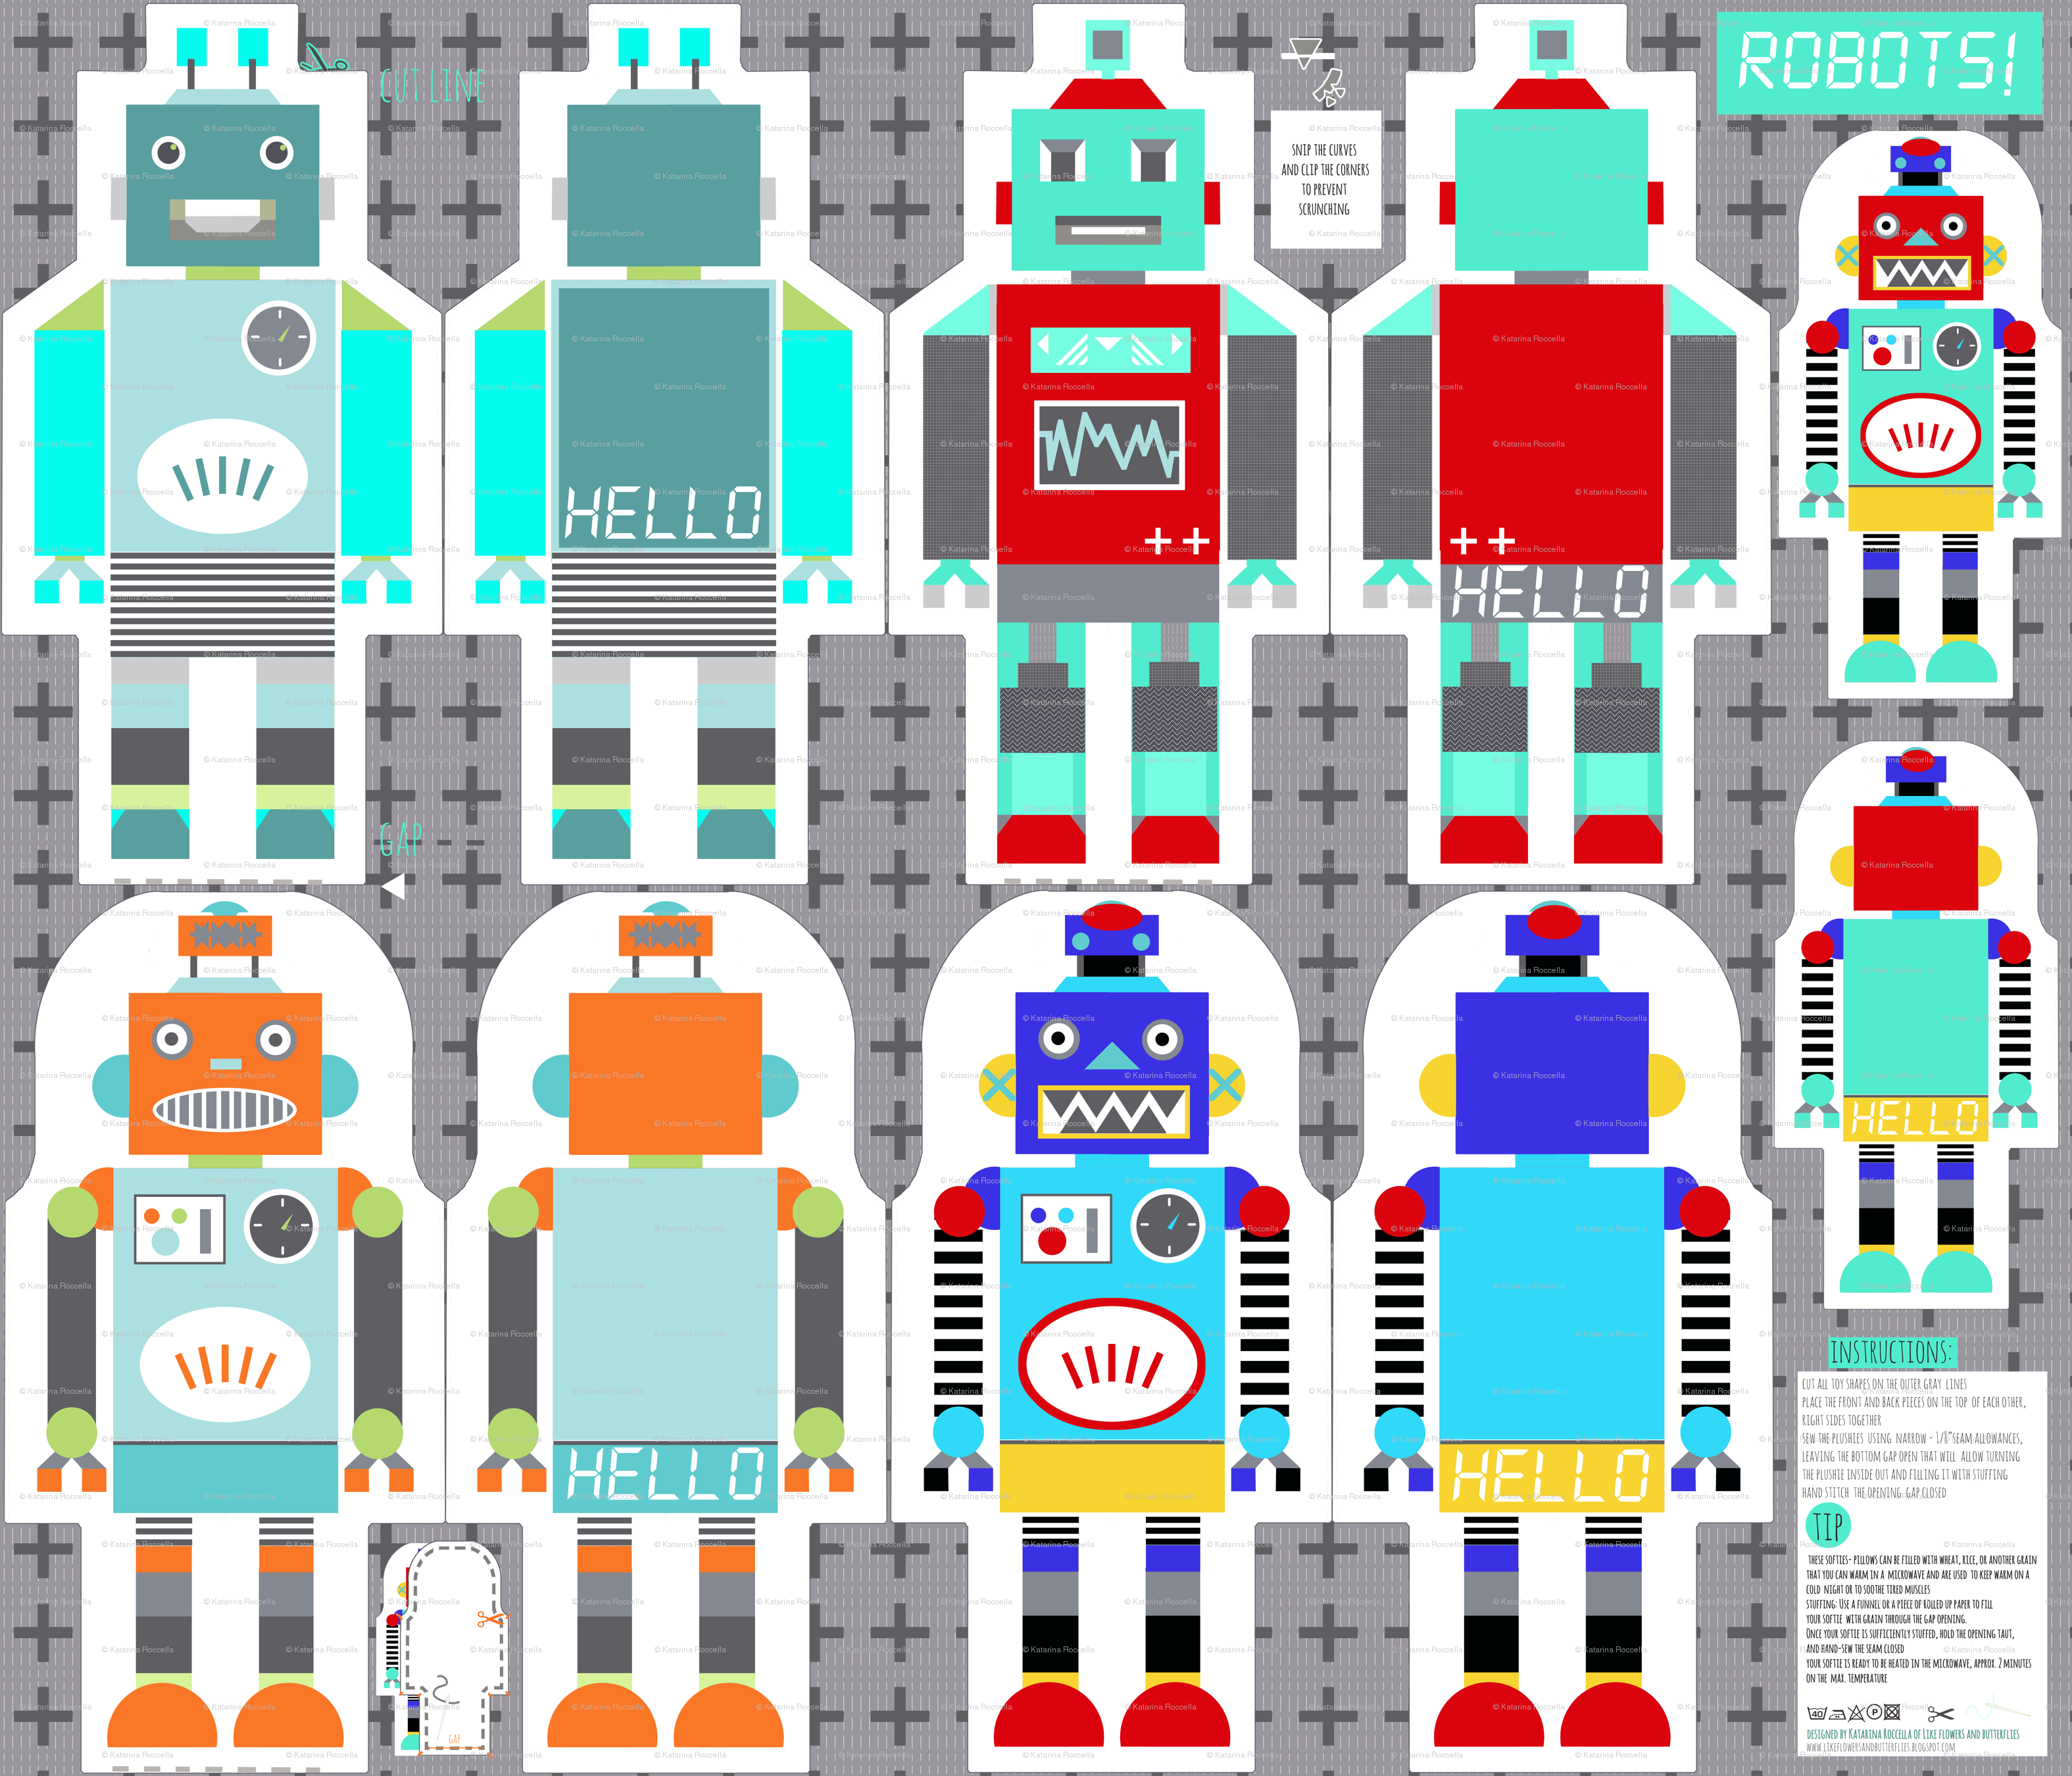 Retro Robot Wallpaper Robots toy template highrespng 3150x2700